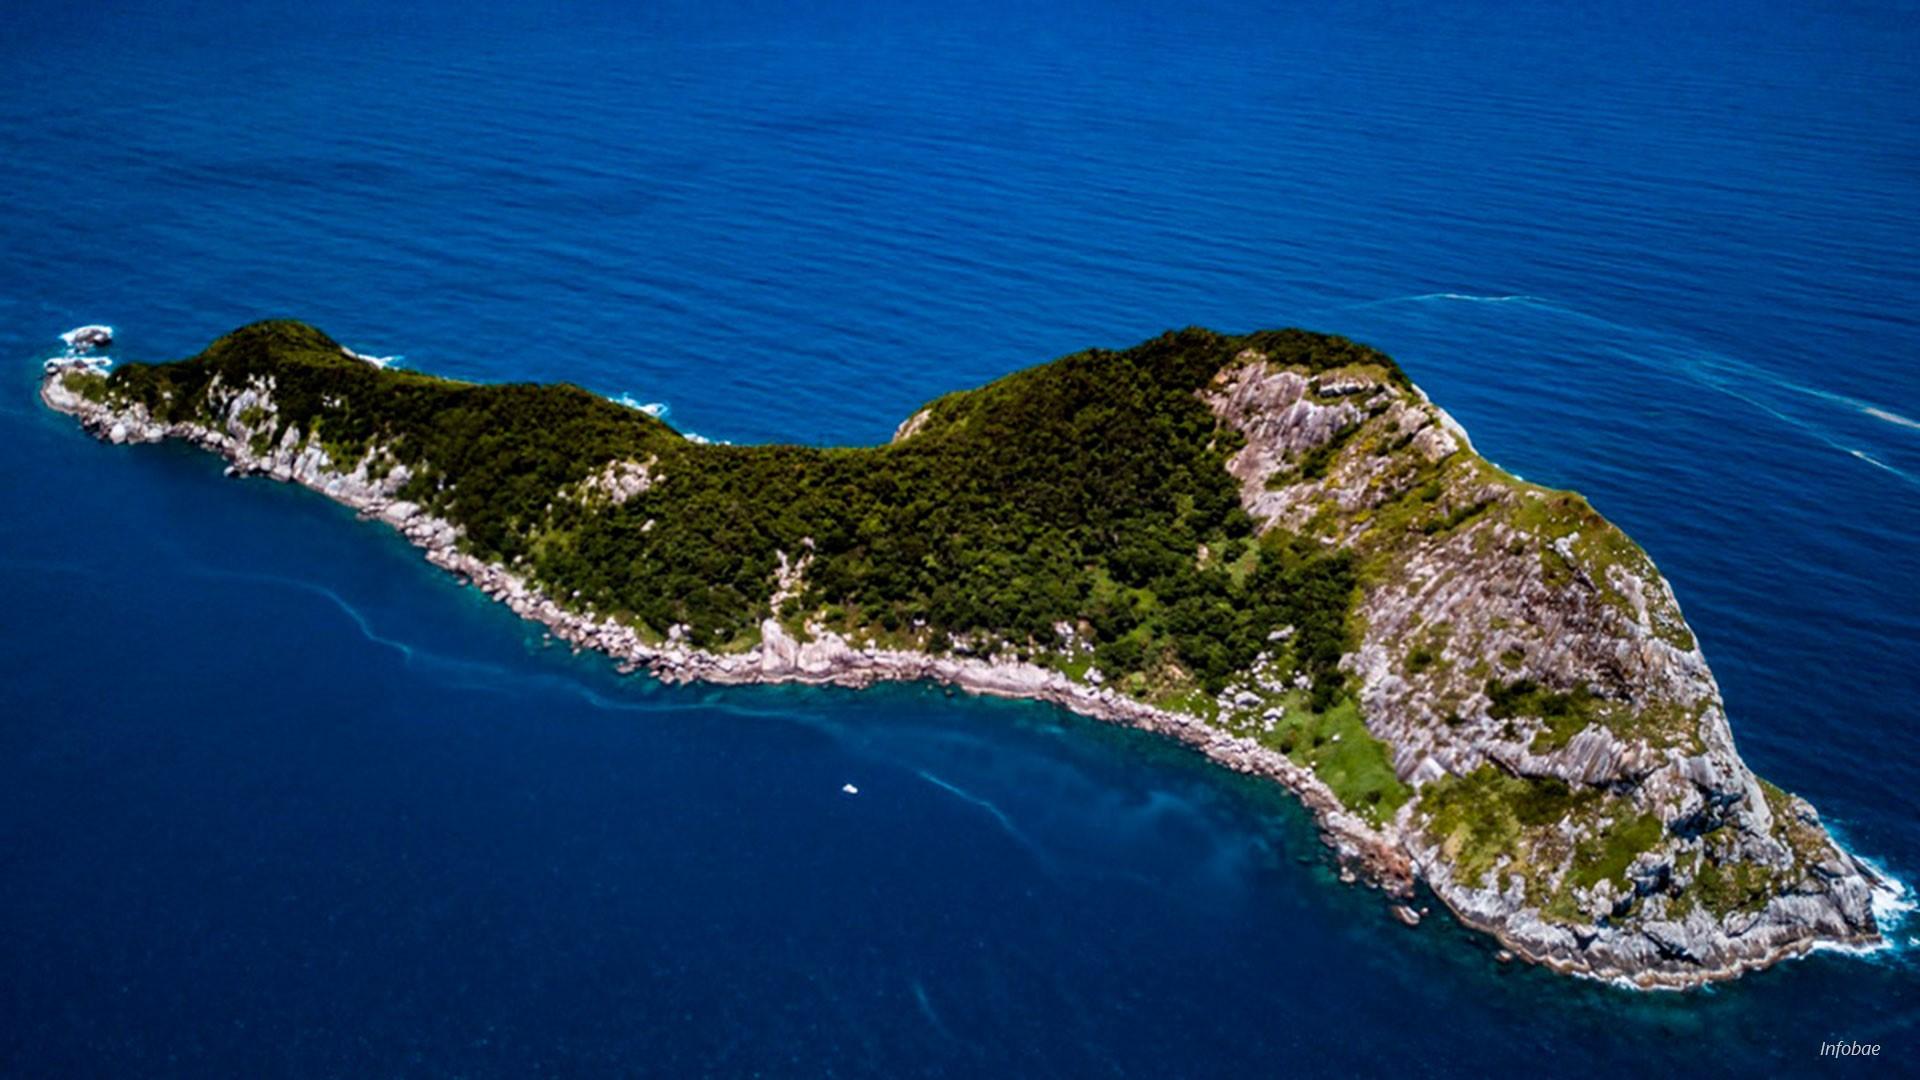 isla queimada grande-serpientes-isla prohibida- lugares prohibidos-lugar prohibido-misterio-tesoros-brasil